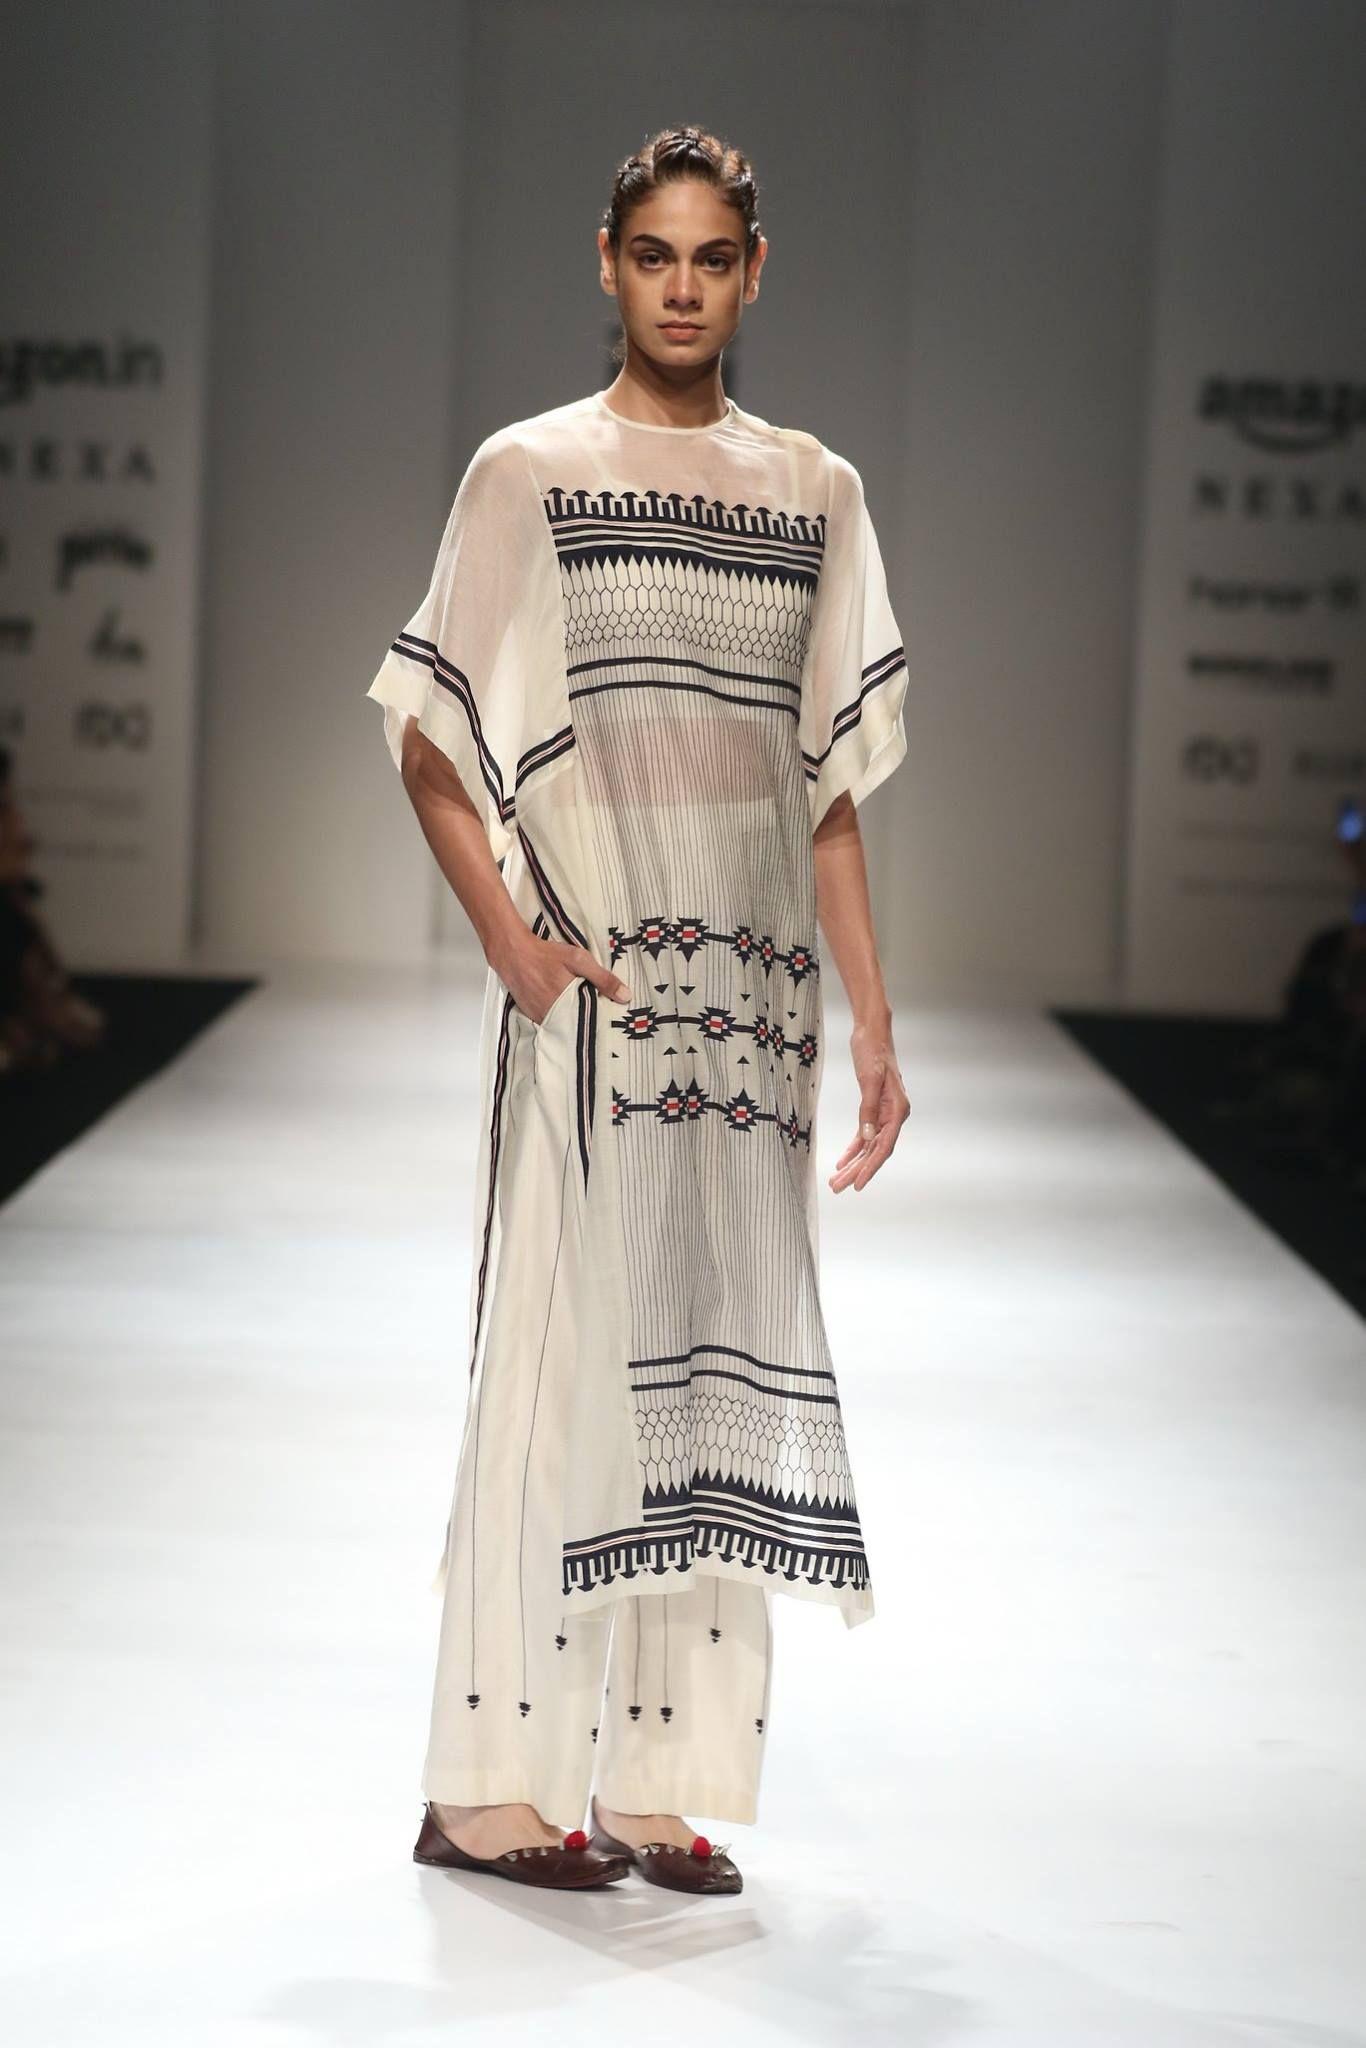 8f2912a0cea6 Ikai by Ragini Ahuja - Amazon India Fashion Week - SS 18 - 2